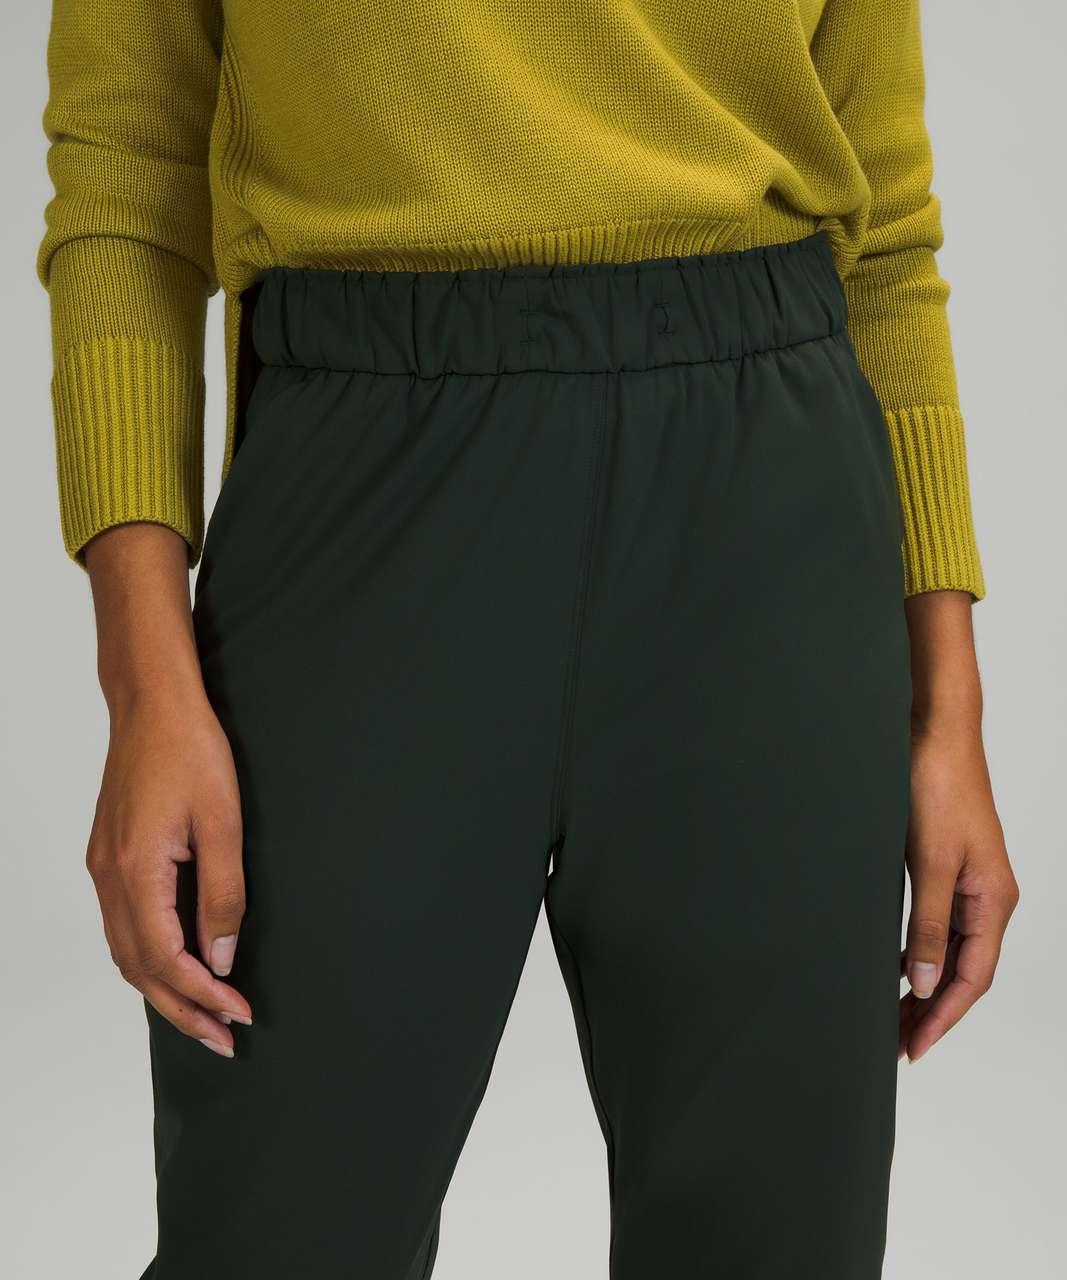 Lululemon Stretch Luxtreme High-Rise Pant *Full Length - Rainforest Green